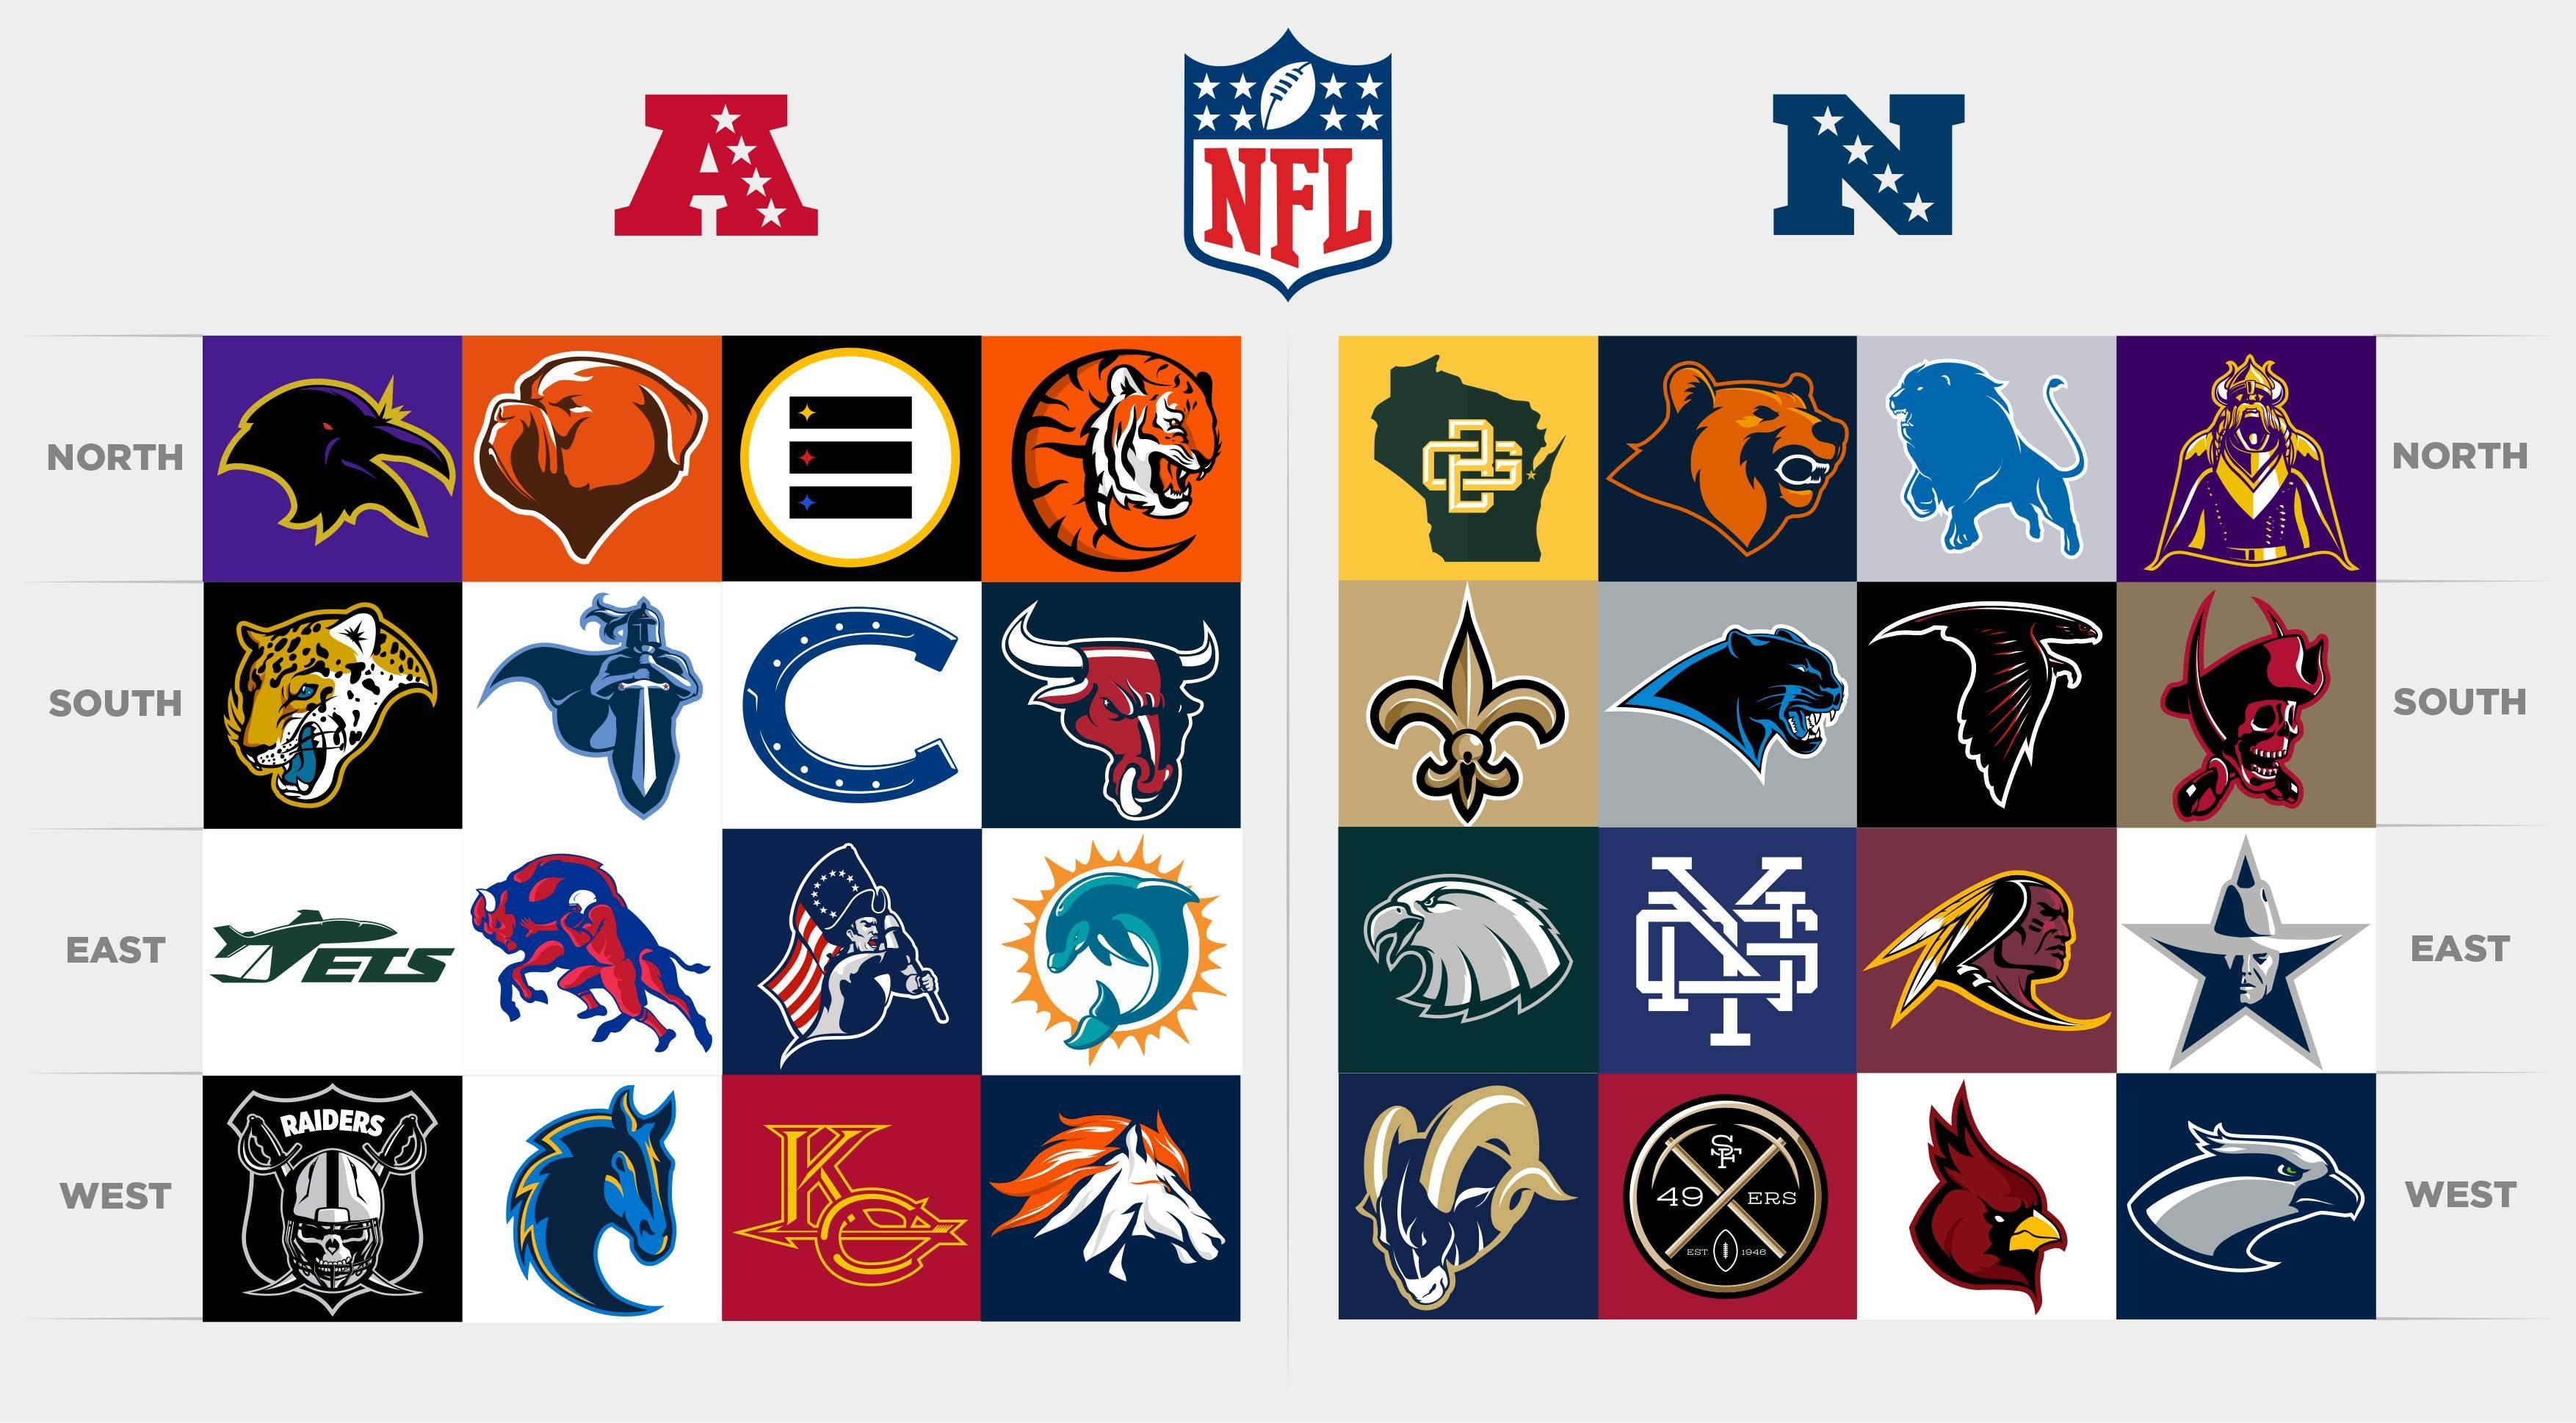 NFL Logo Teams wallpaper HD 2016 in Football | Wallpapers HD